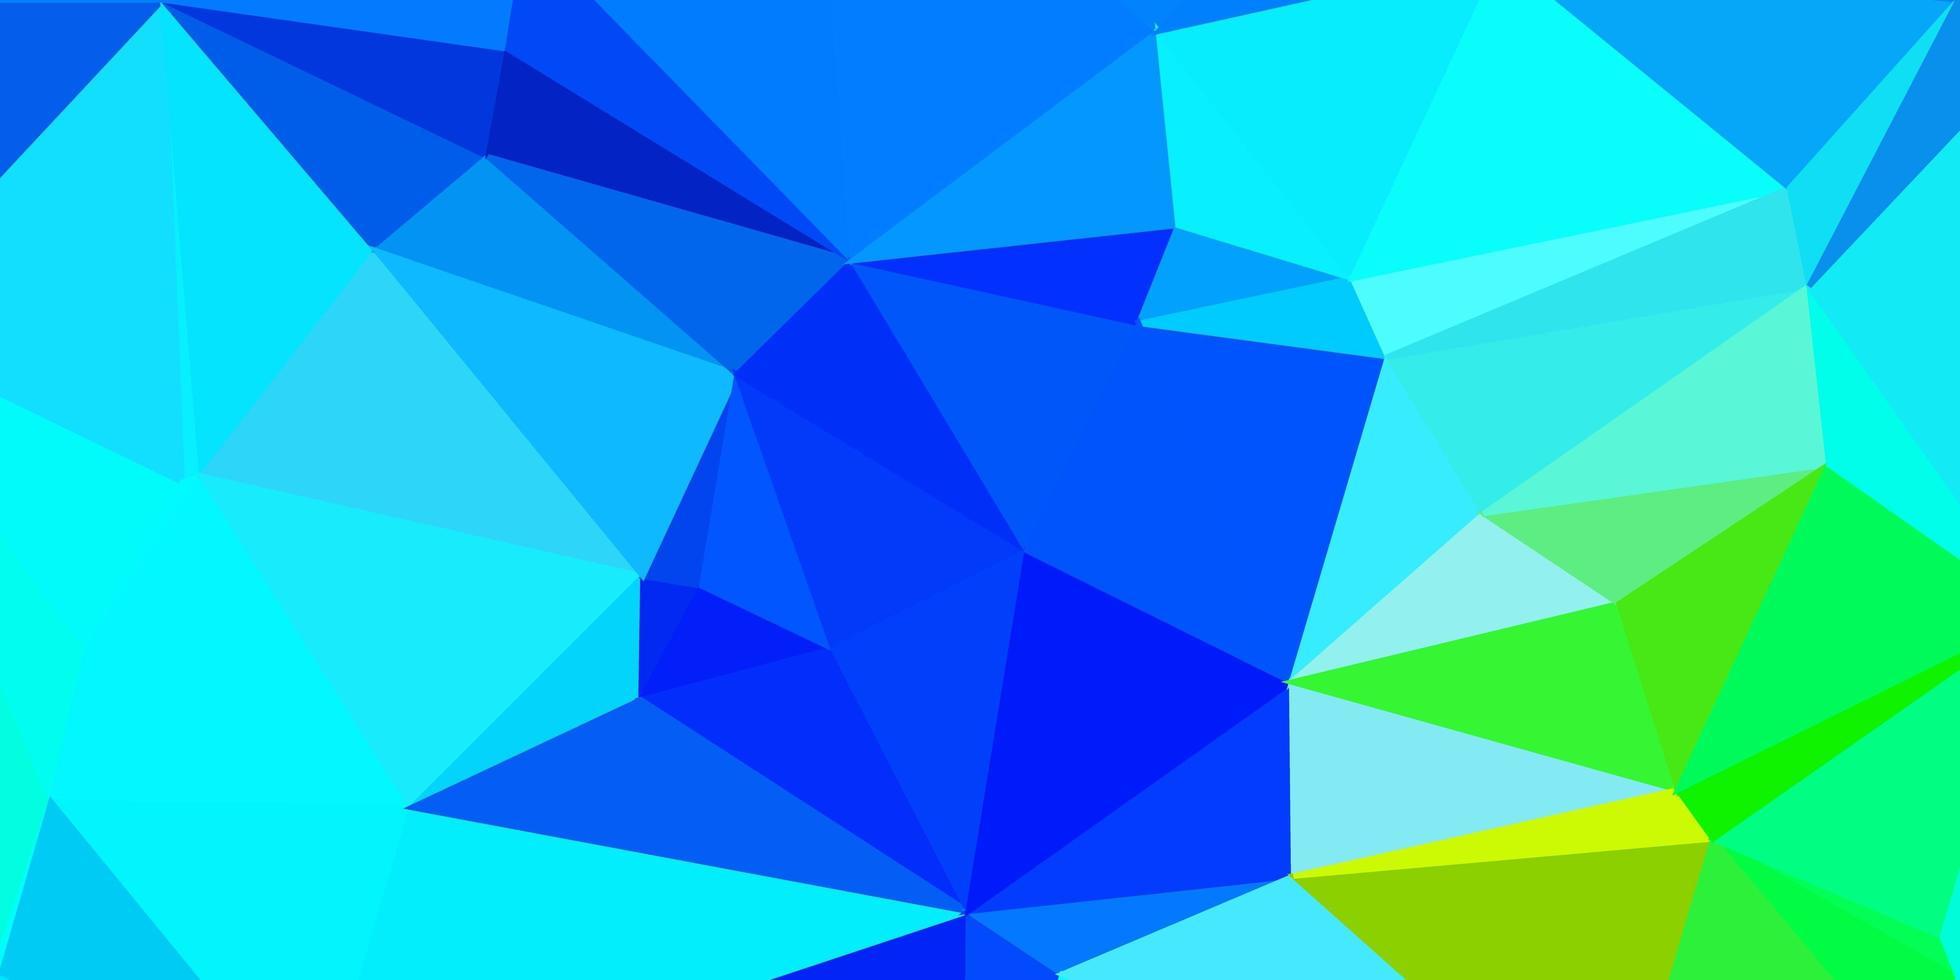 mörkblå, grön vektor poly triangel layout.